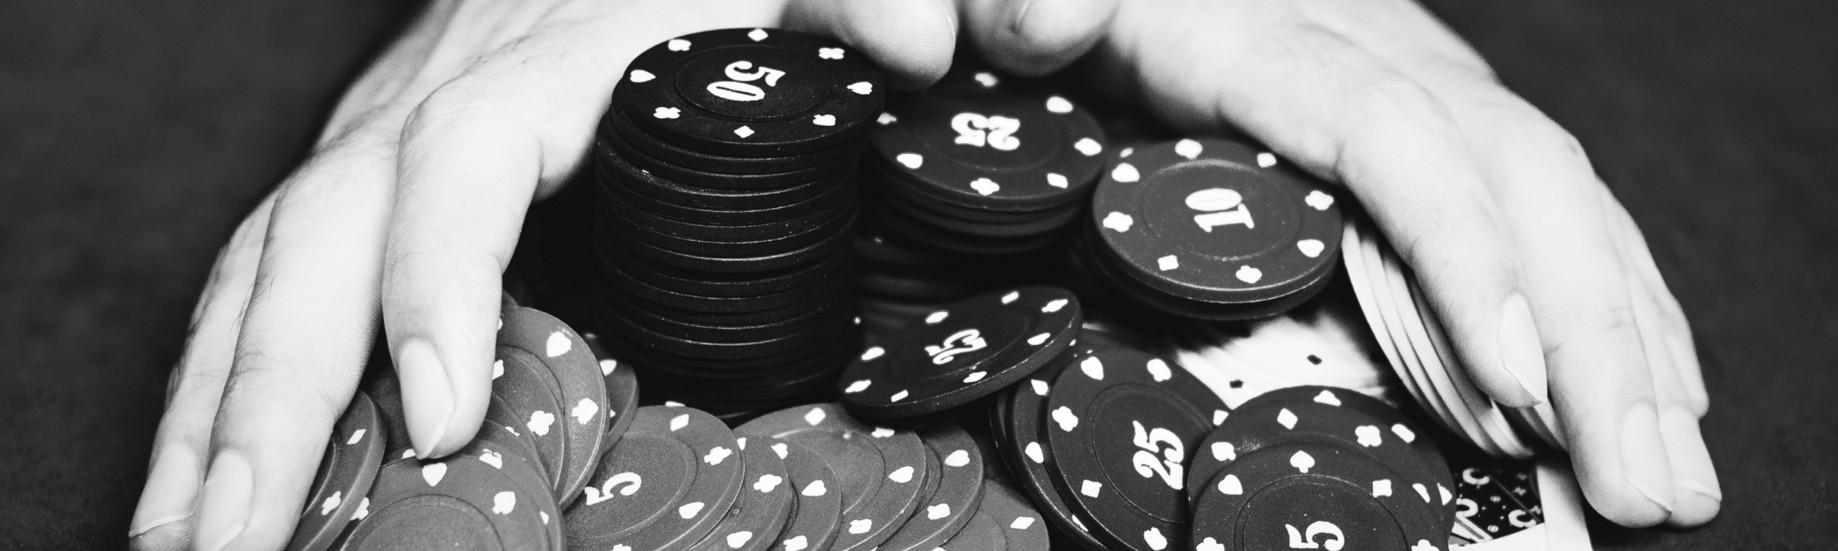 Playing The Free Casino Games Online Gambling